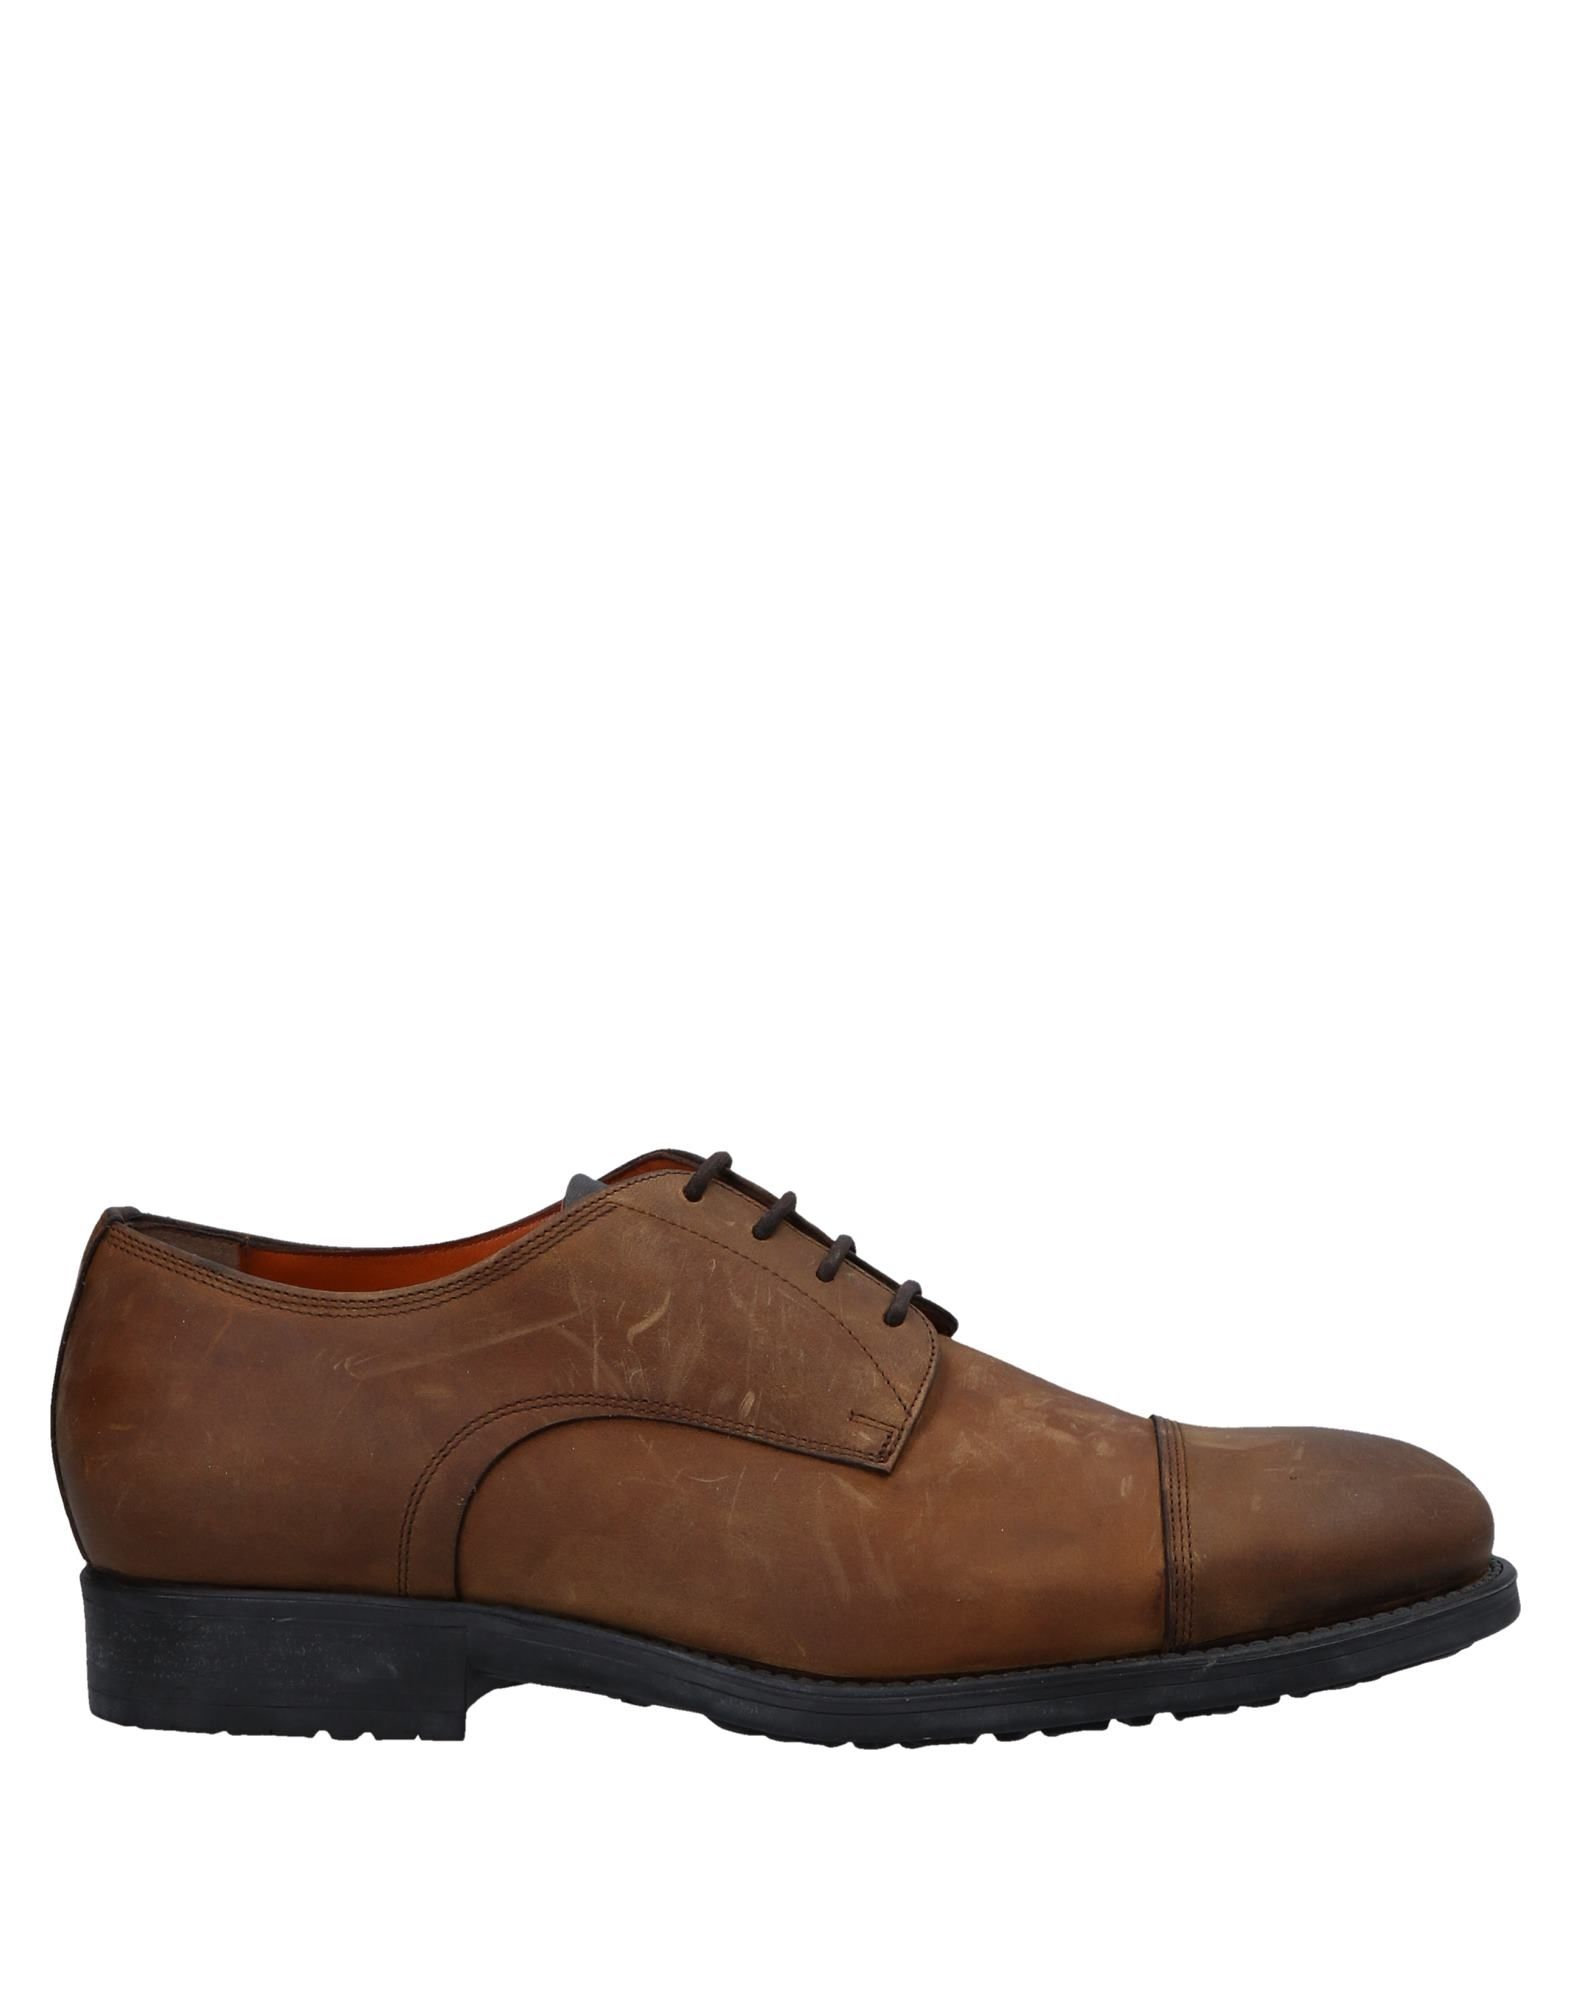 SANTONI SHABBY CHIC Обувь на шнурках